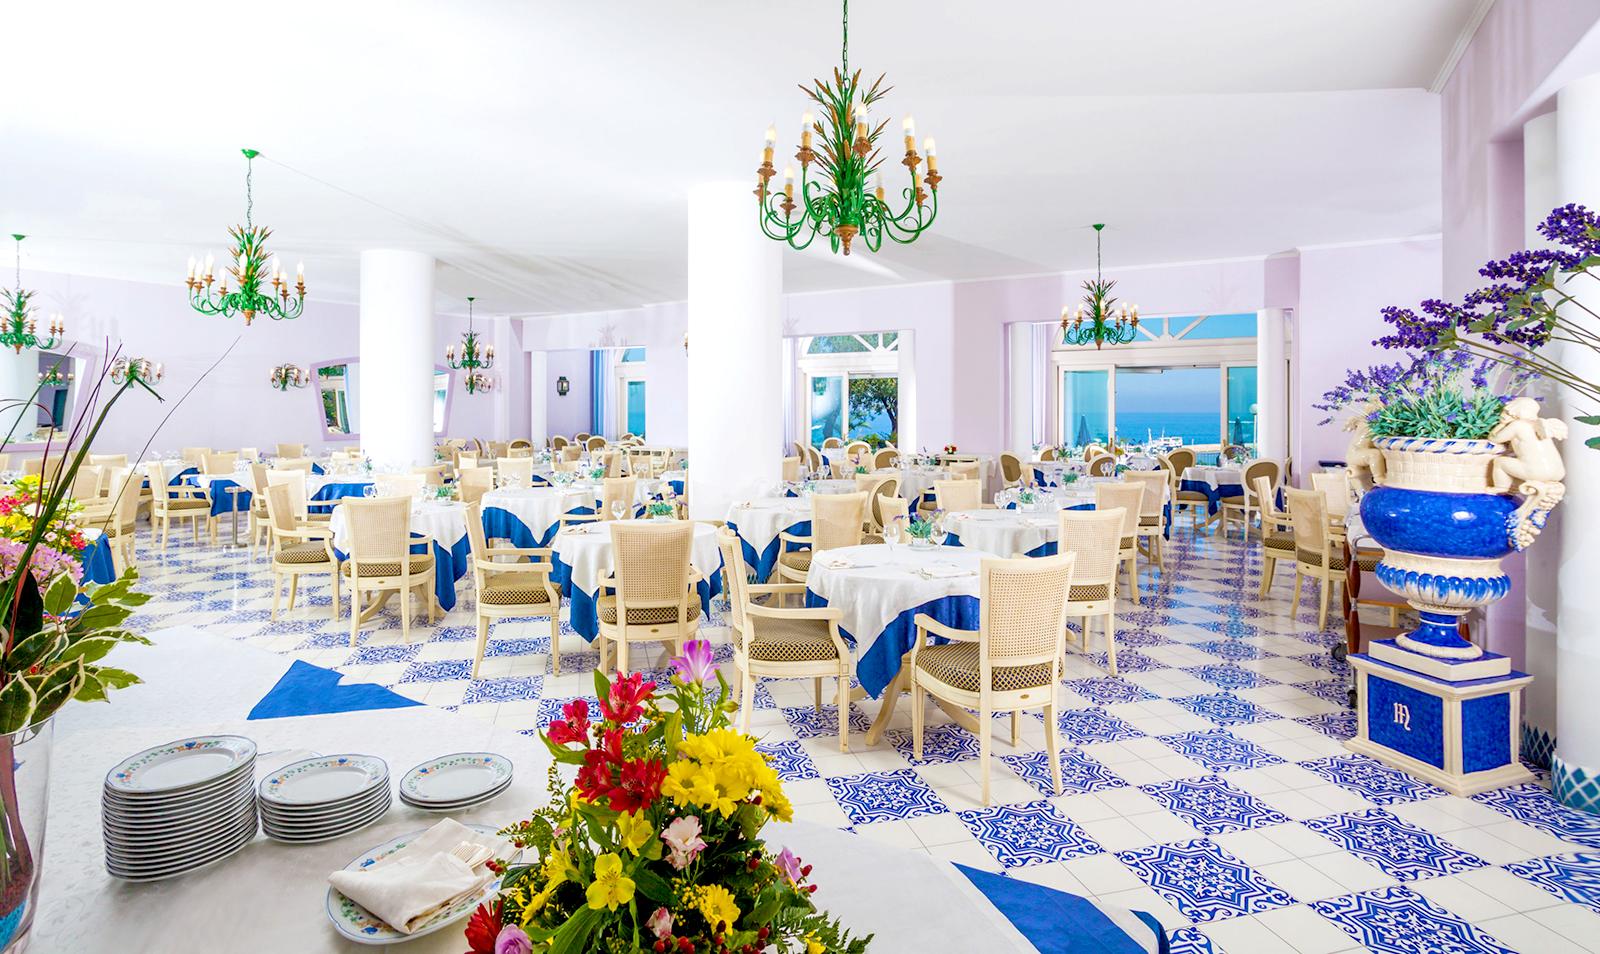 hotel-terme-gran-paradiso-ischia-casamicciola-ristorante-1